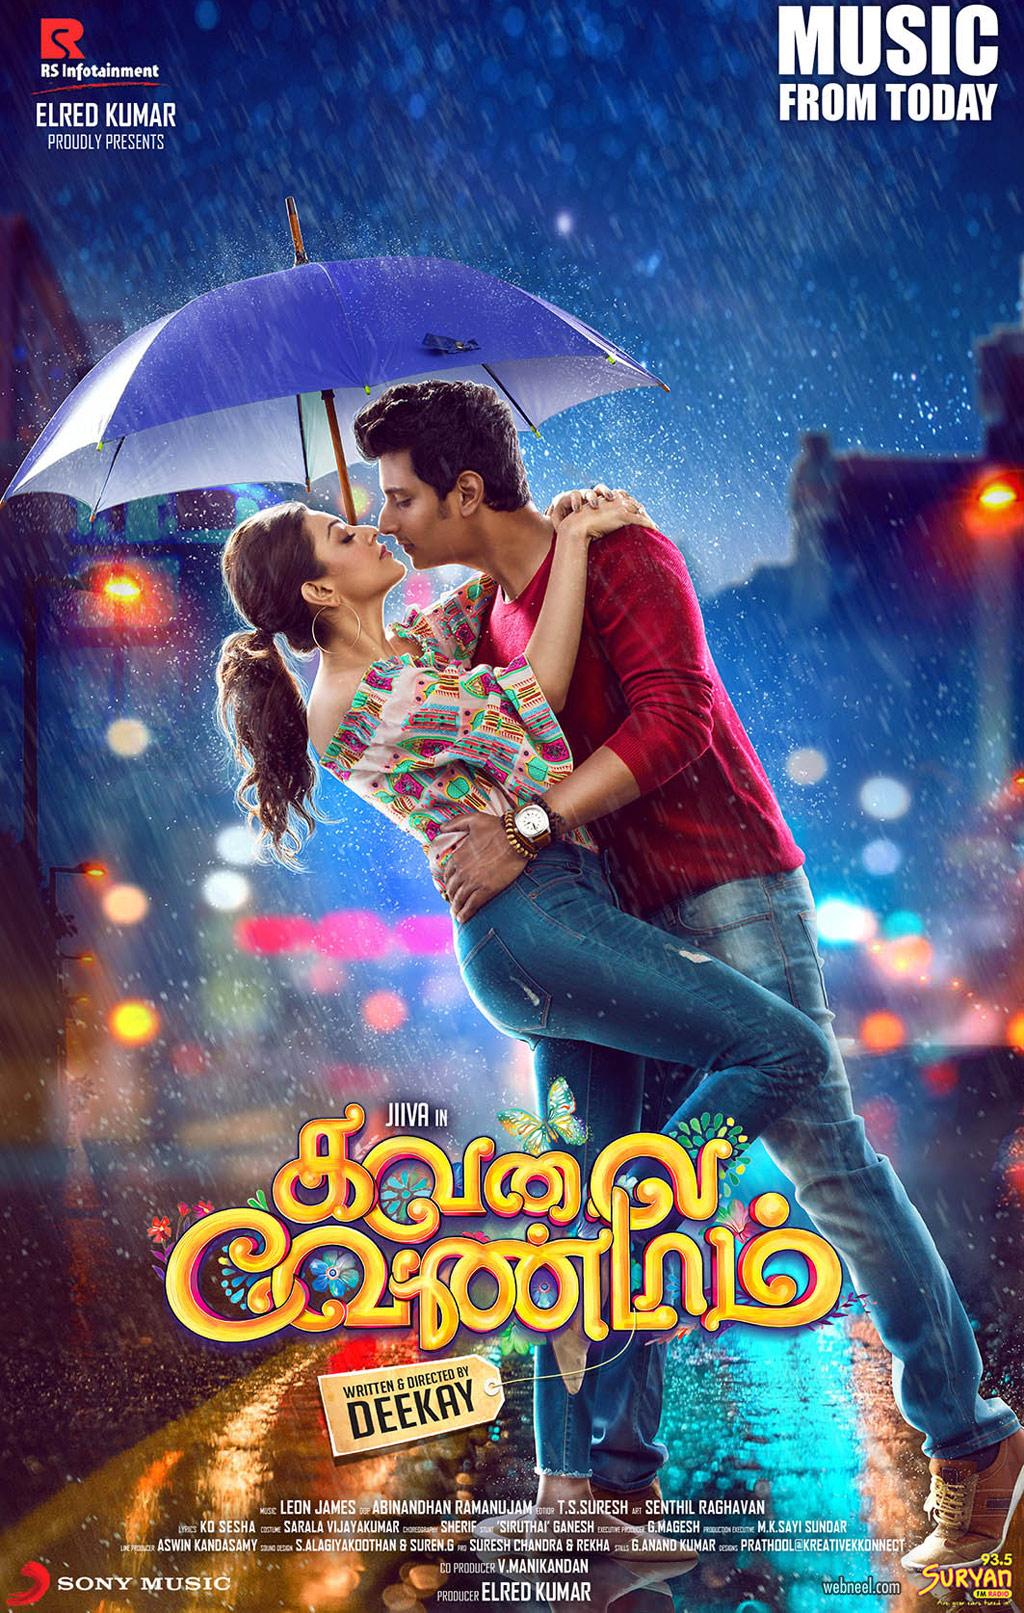 movie poster design tamil kavalai vendam by prathoolnt